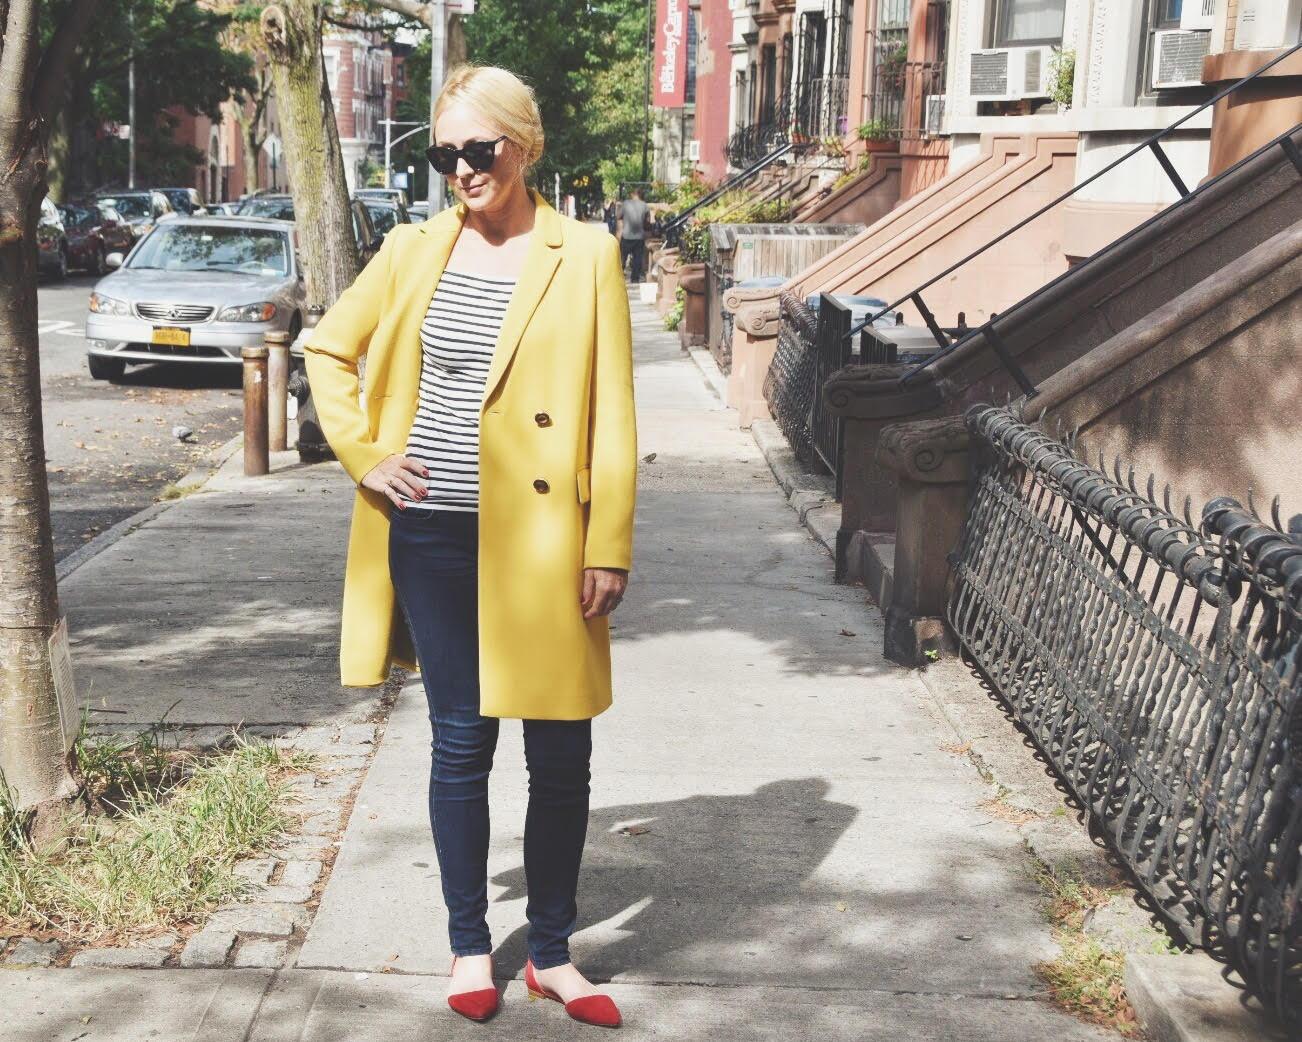 Chondra Sanchez in yellow Lafayette 148 coat on Brooklyn street